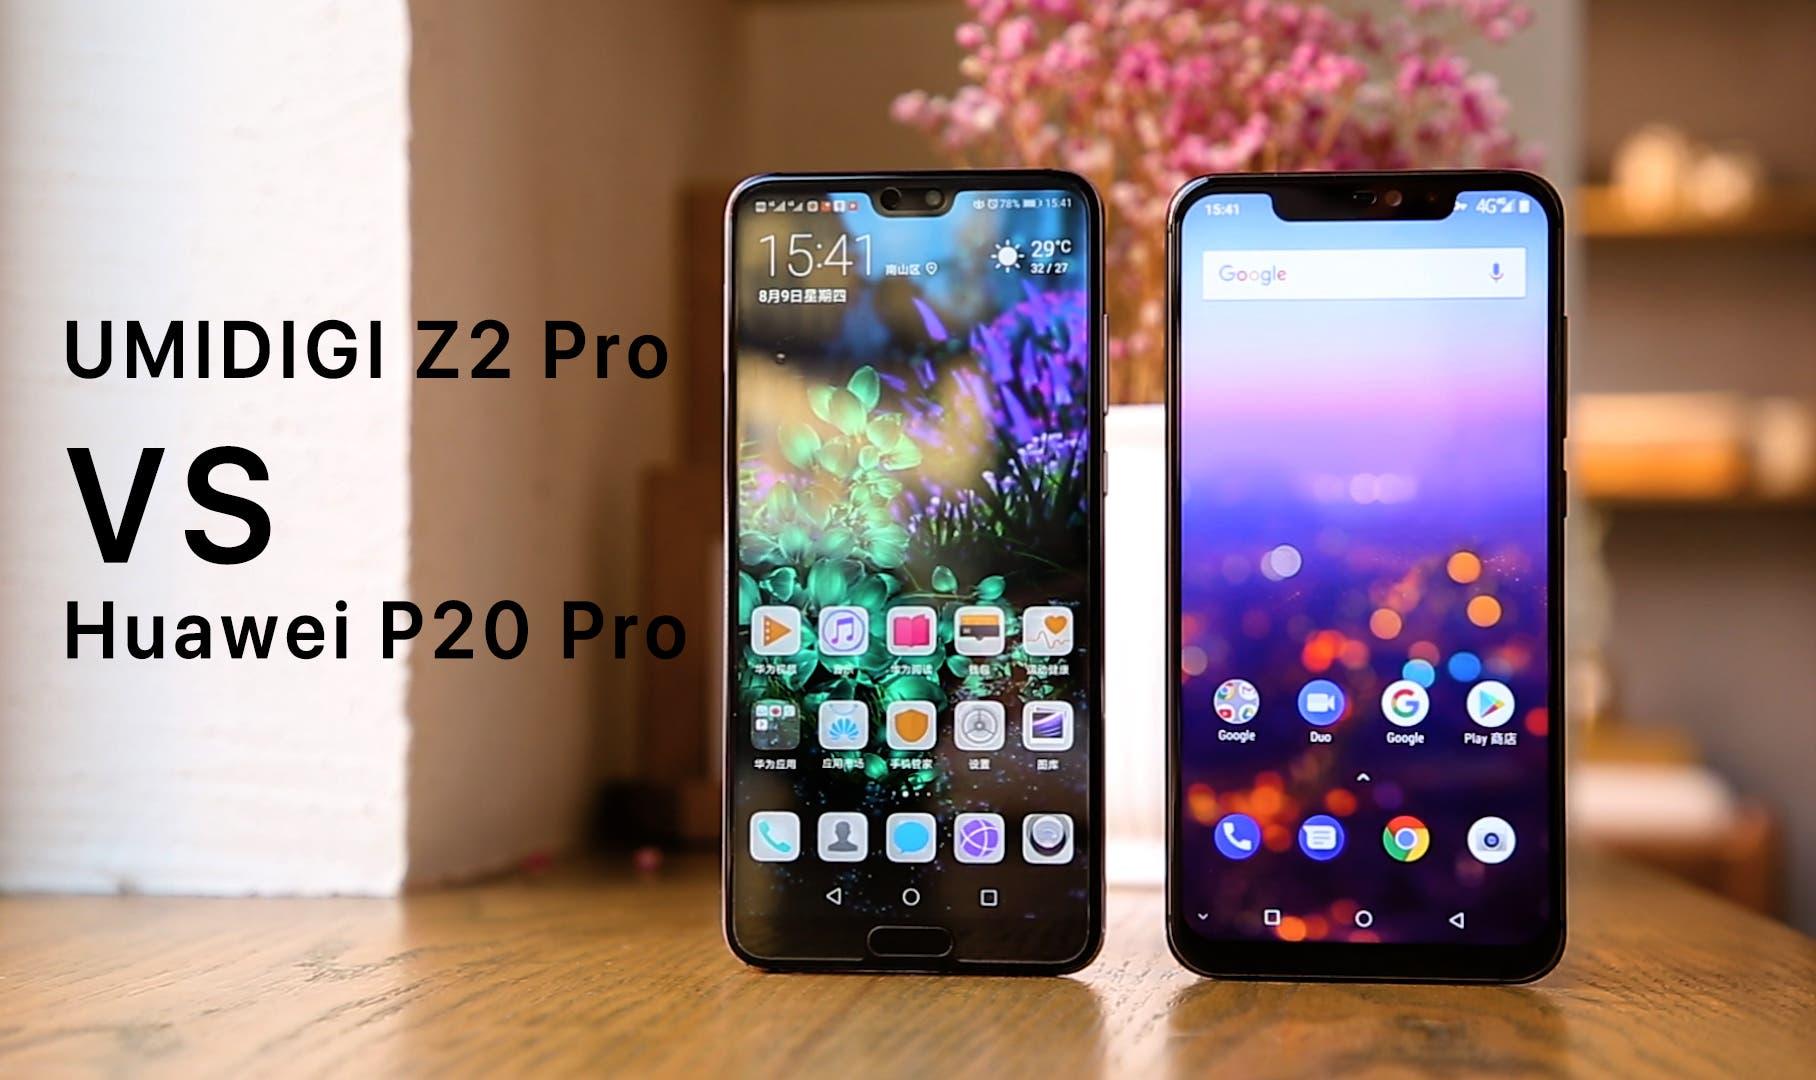 UMIDIGI Z2 Pro vs Huawei P20 Pro